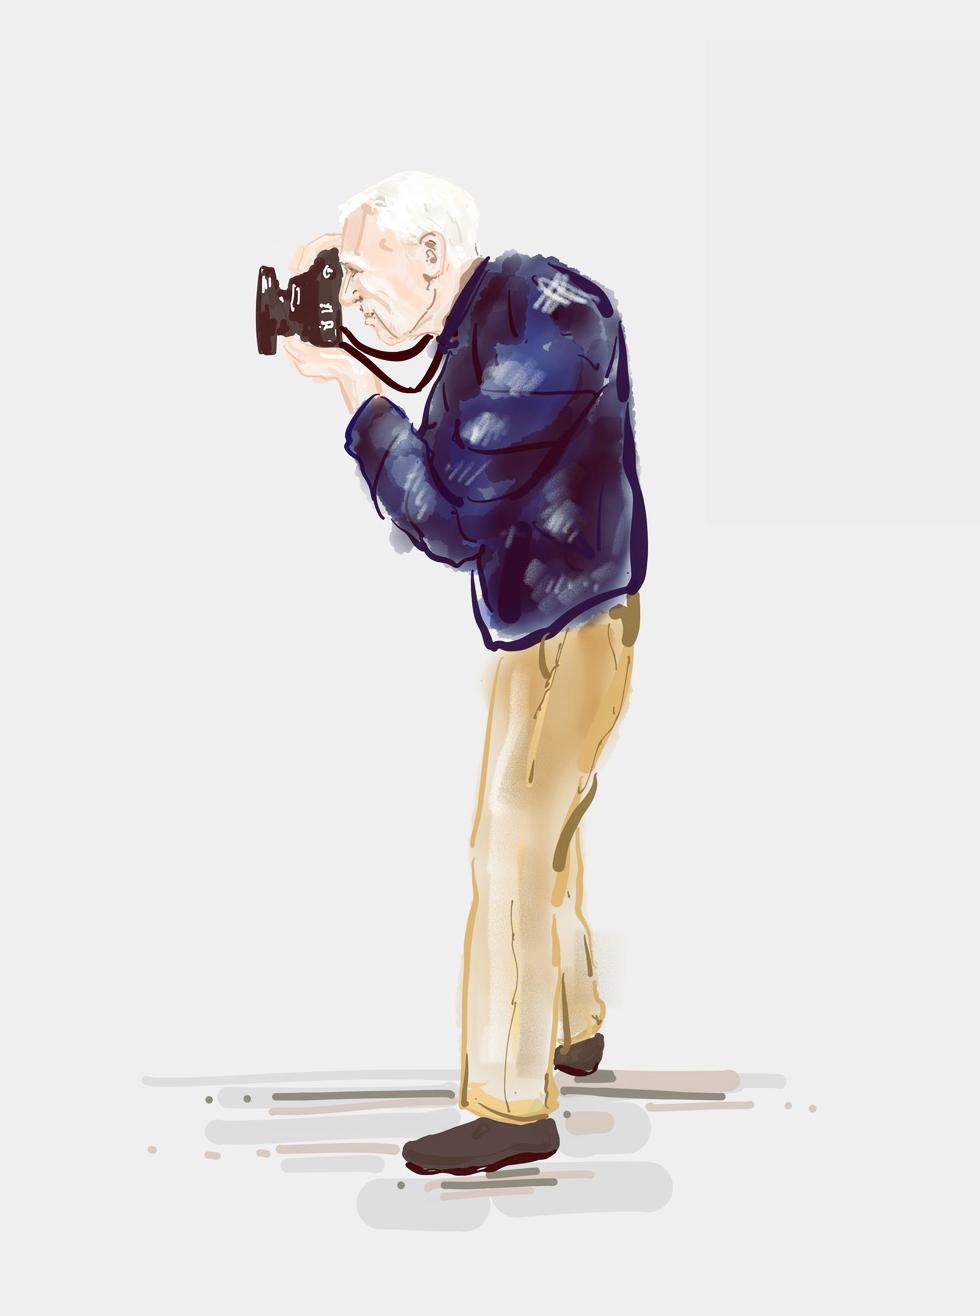 Illustration by Janelle Sing -